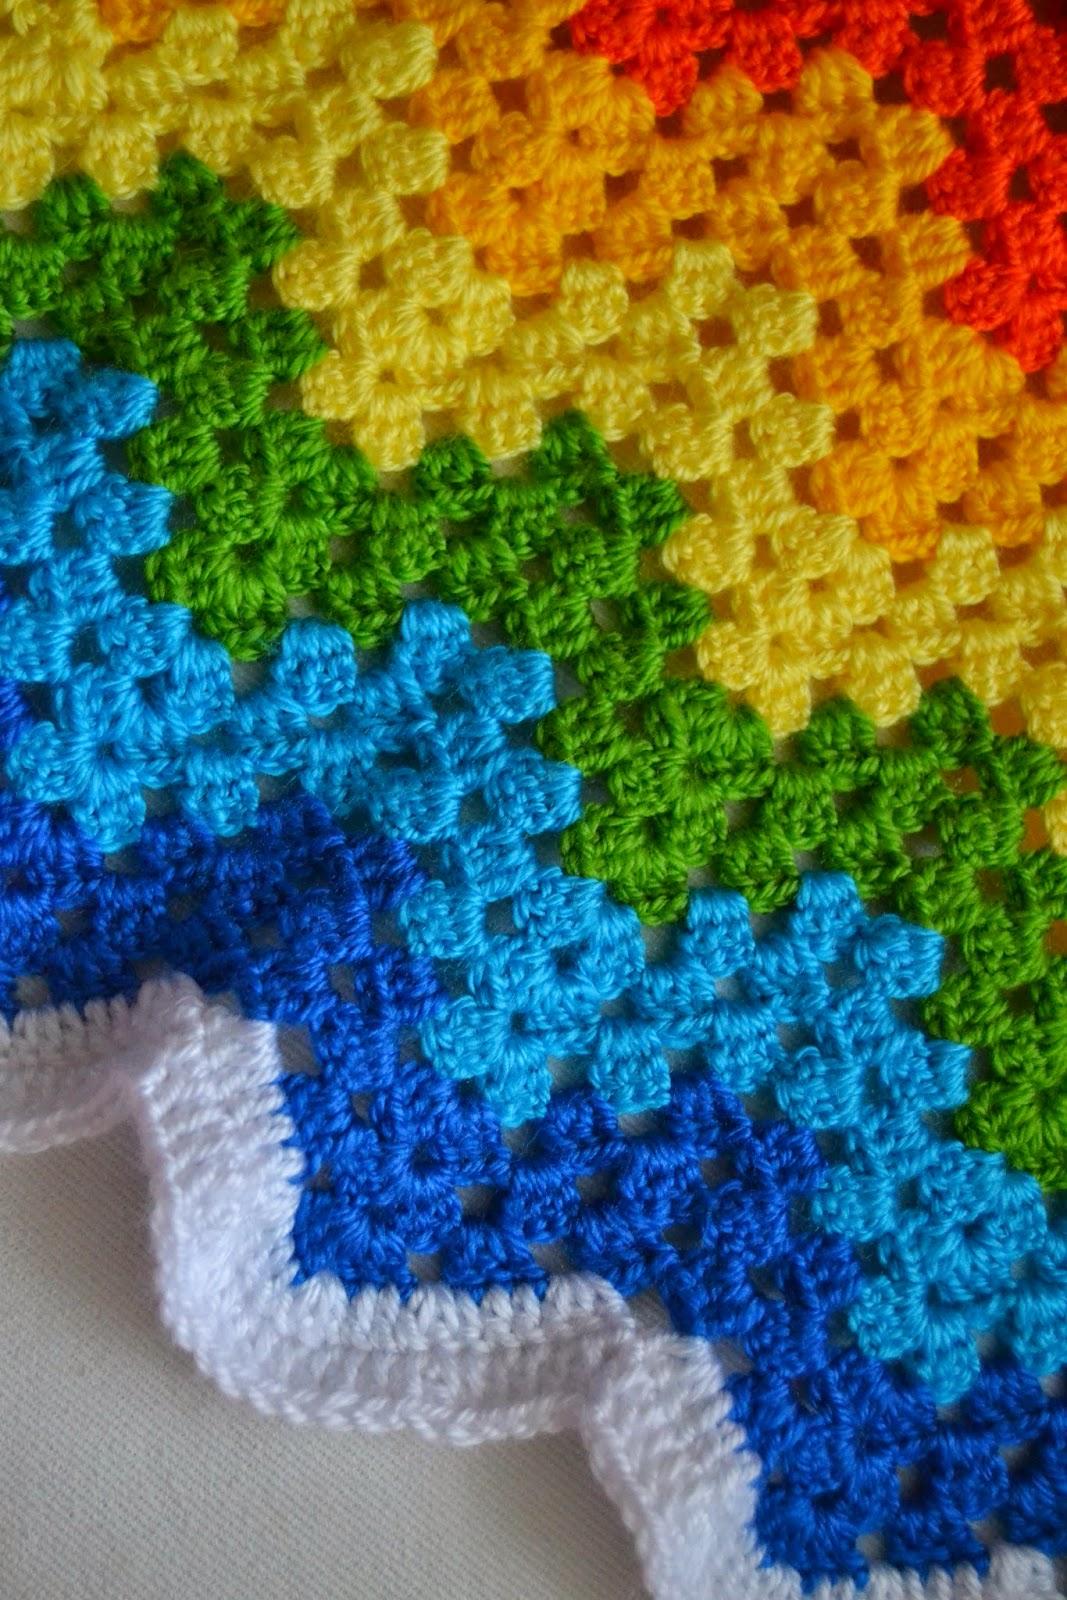 Zig zag örgü battaniyenin yapımı-crochet granny ripple blanket